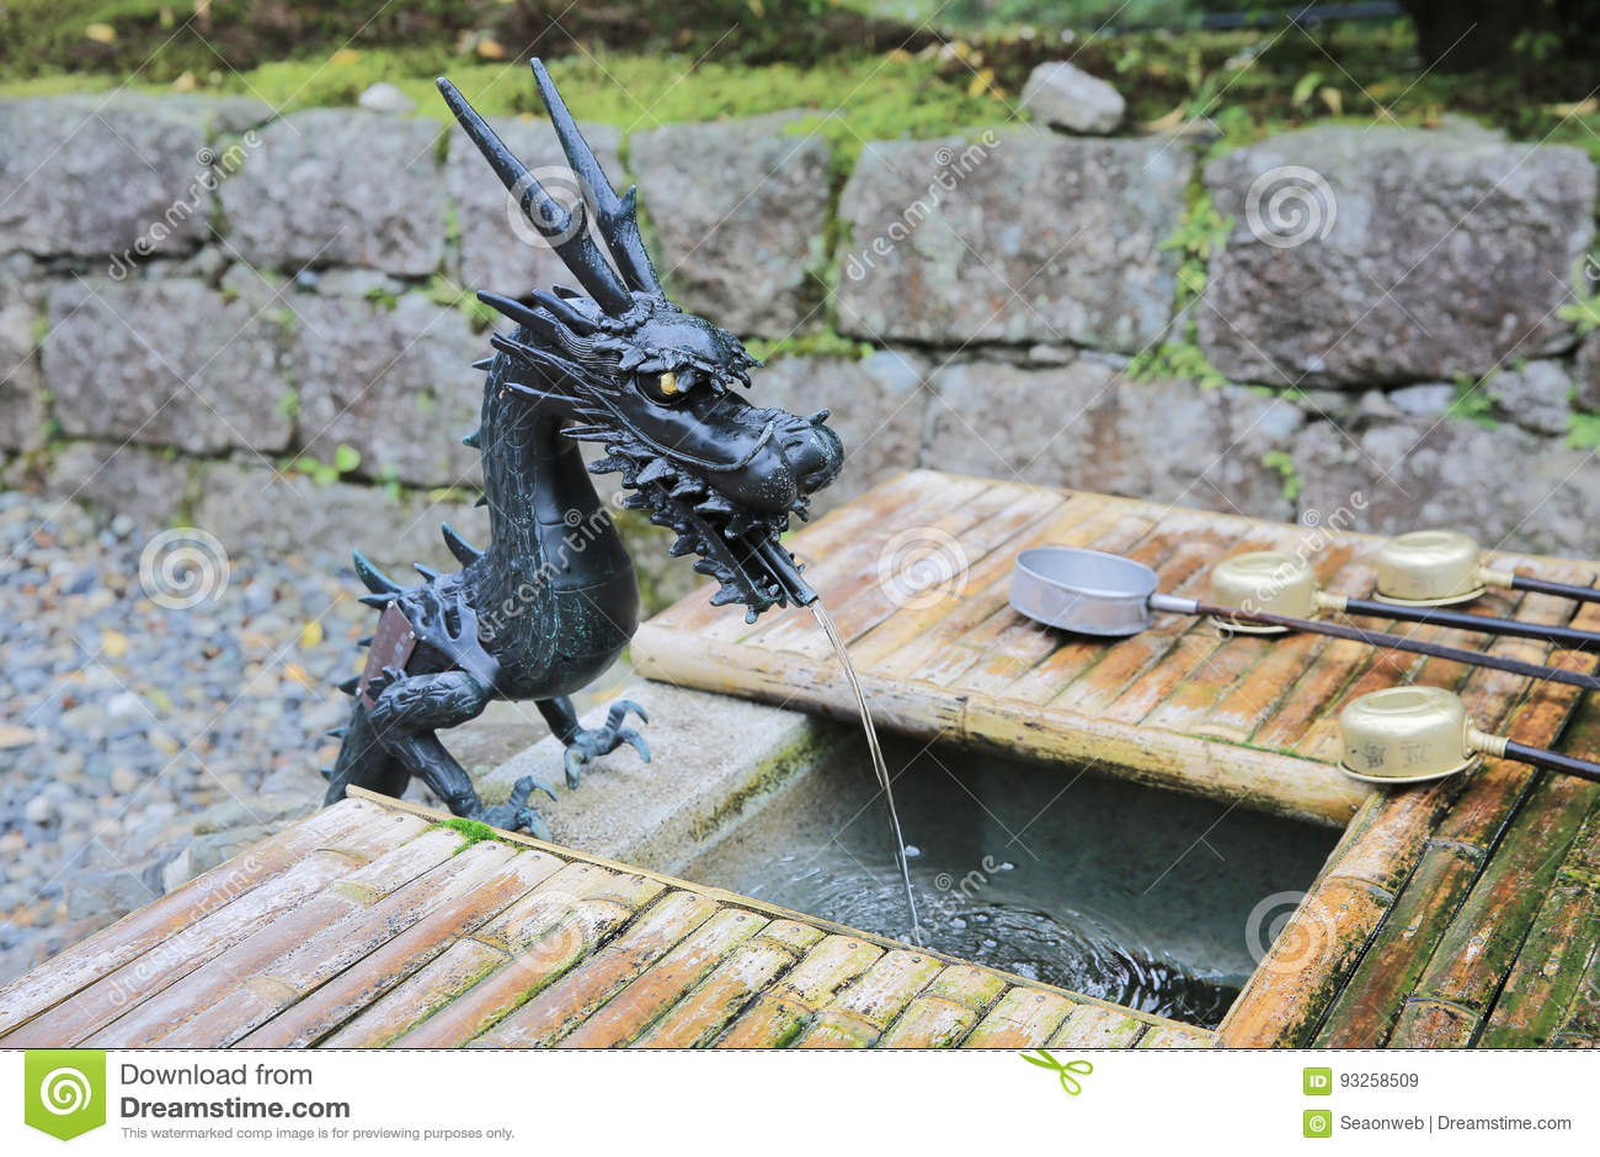 Japanischer Bambusbrunnen Stockbild Bild Von Bambus 93258509